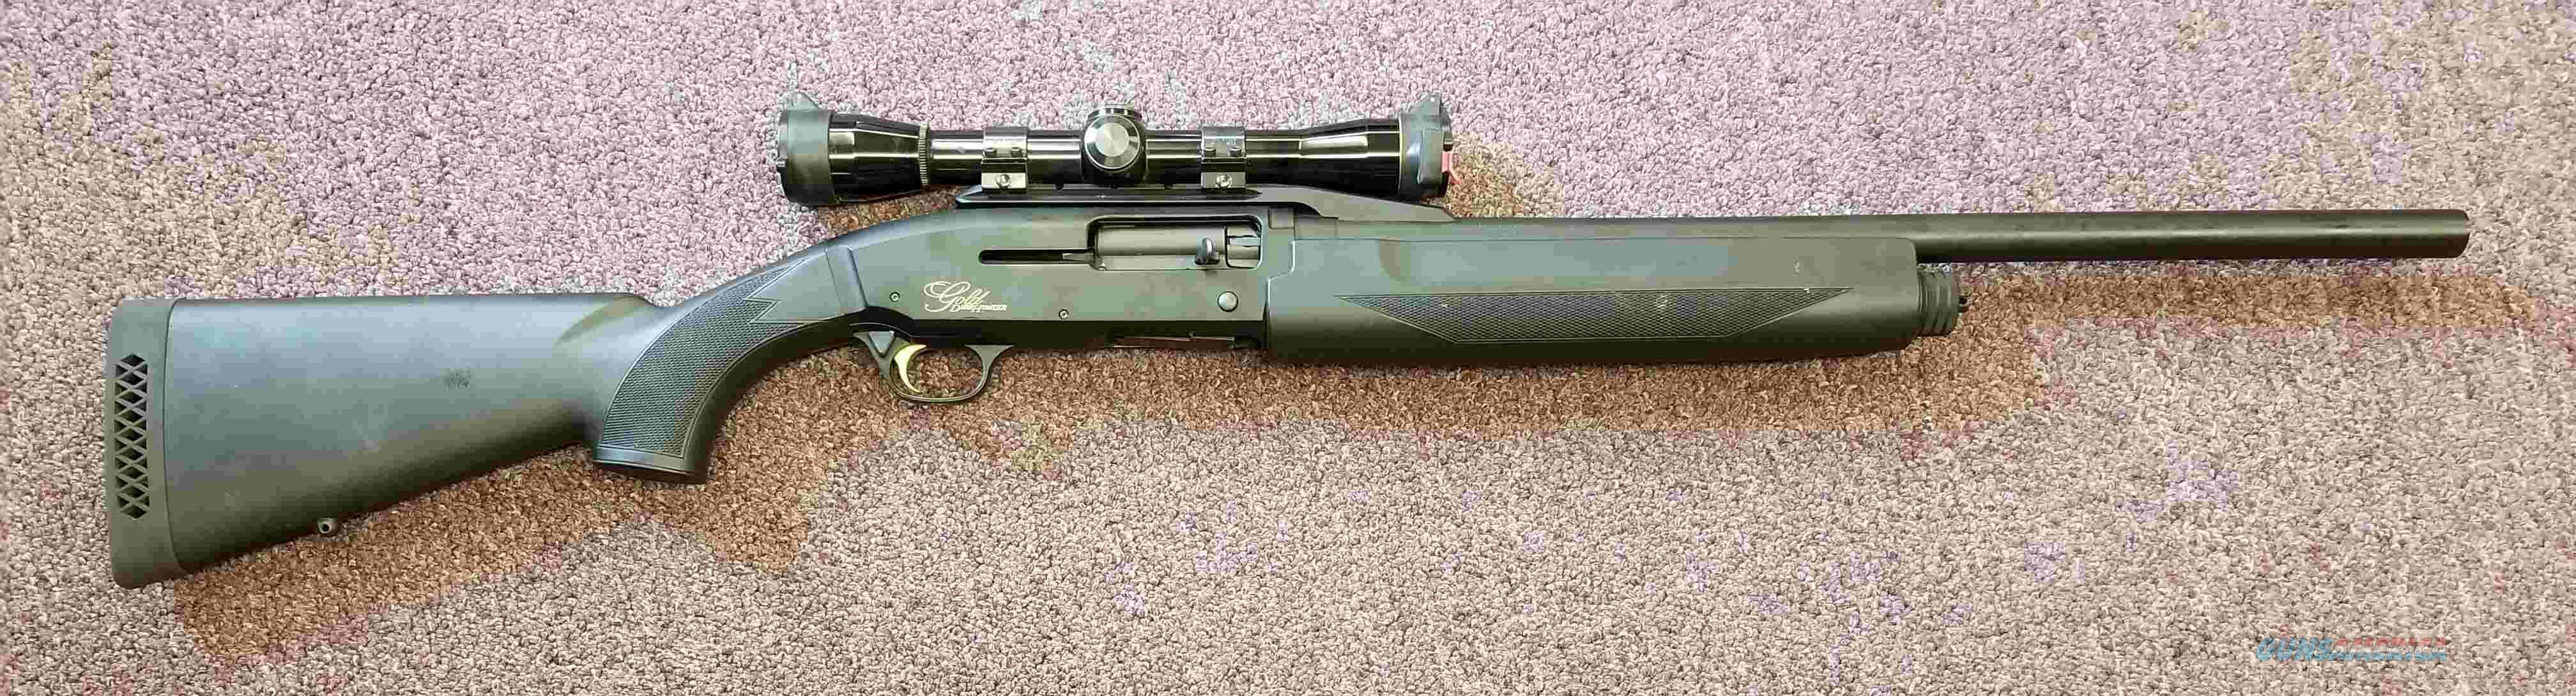 Browning Gold Deer Hunter - 12 Gauge - Semi Auto - Leupold 4X - FREE SHIPPING !!!  Guns > Shotguns > Browning Shotguns > Autoloaders > Hunting